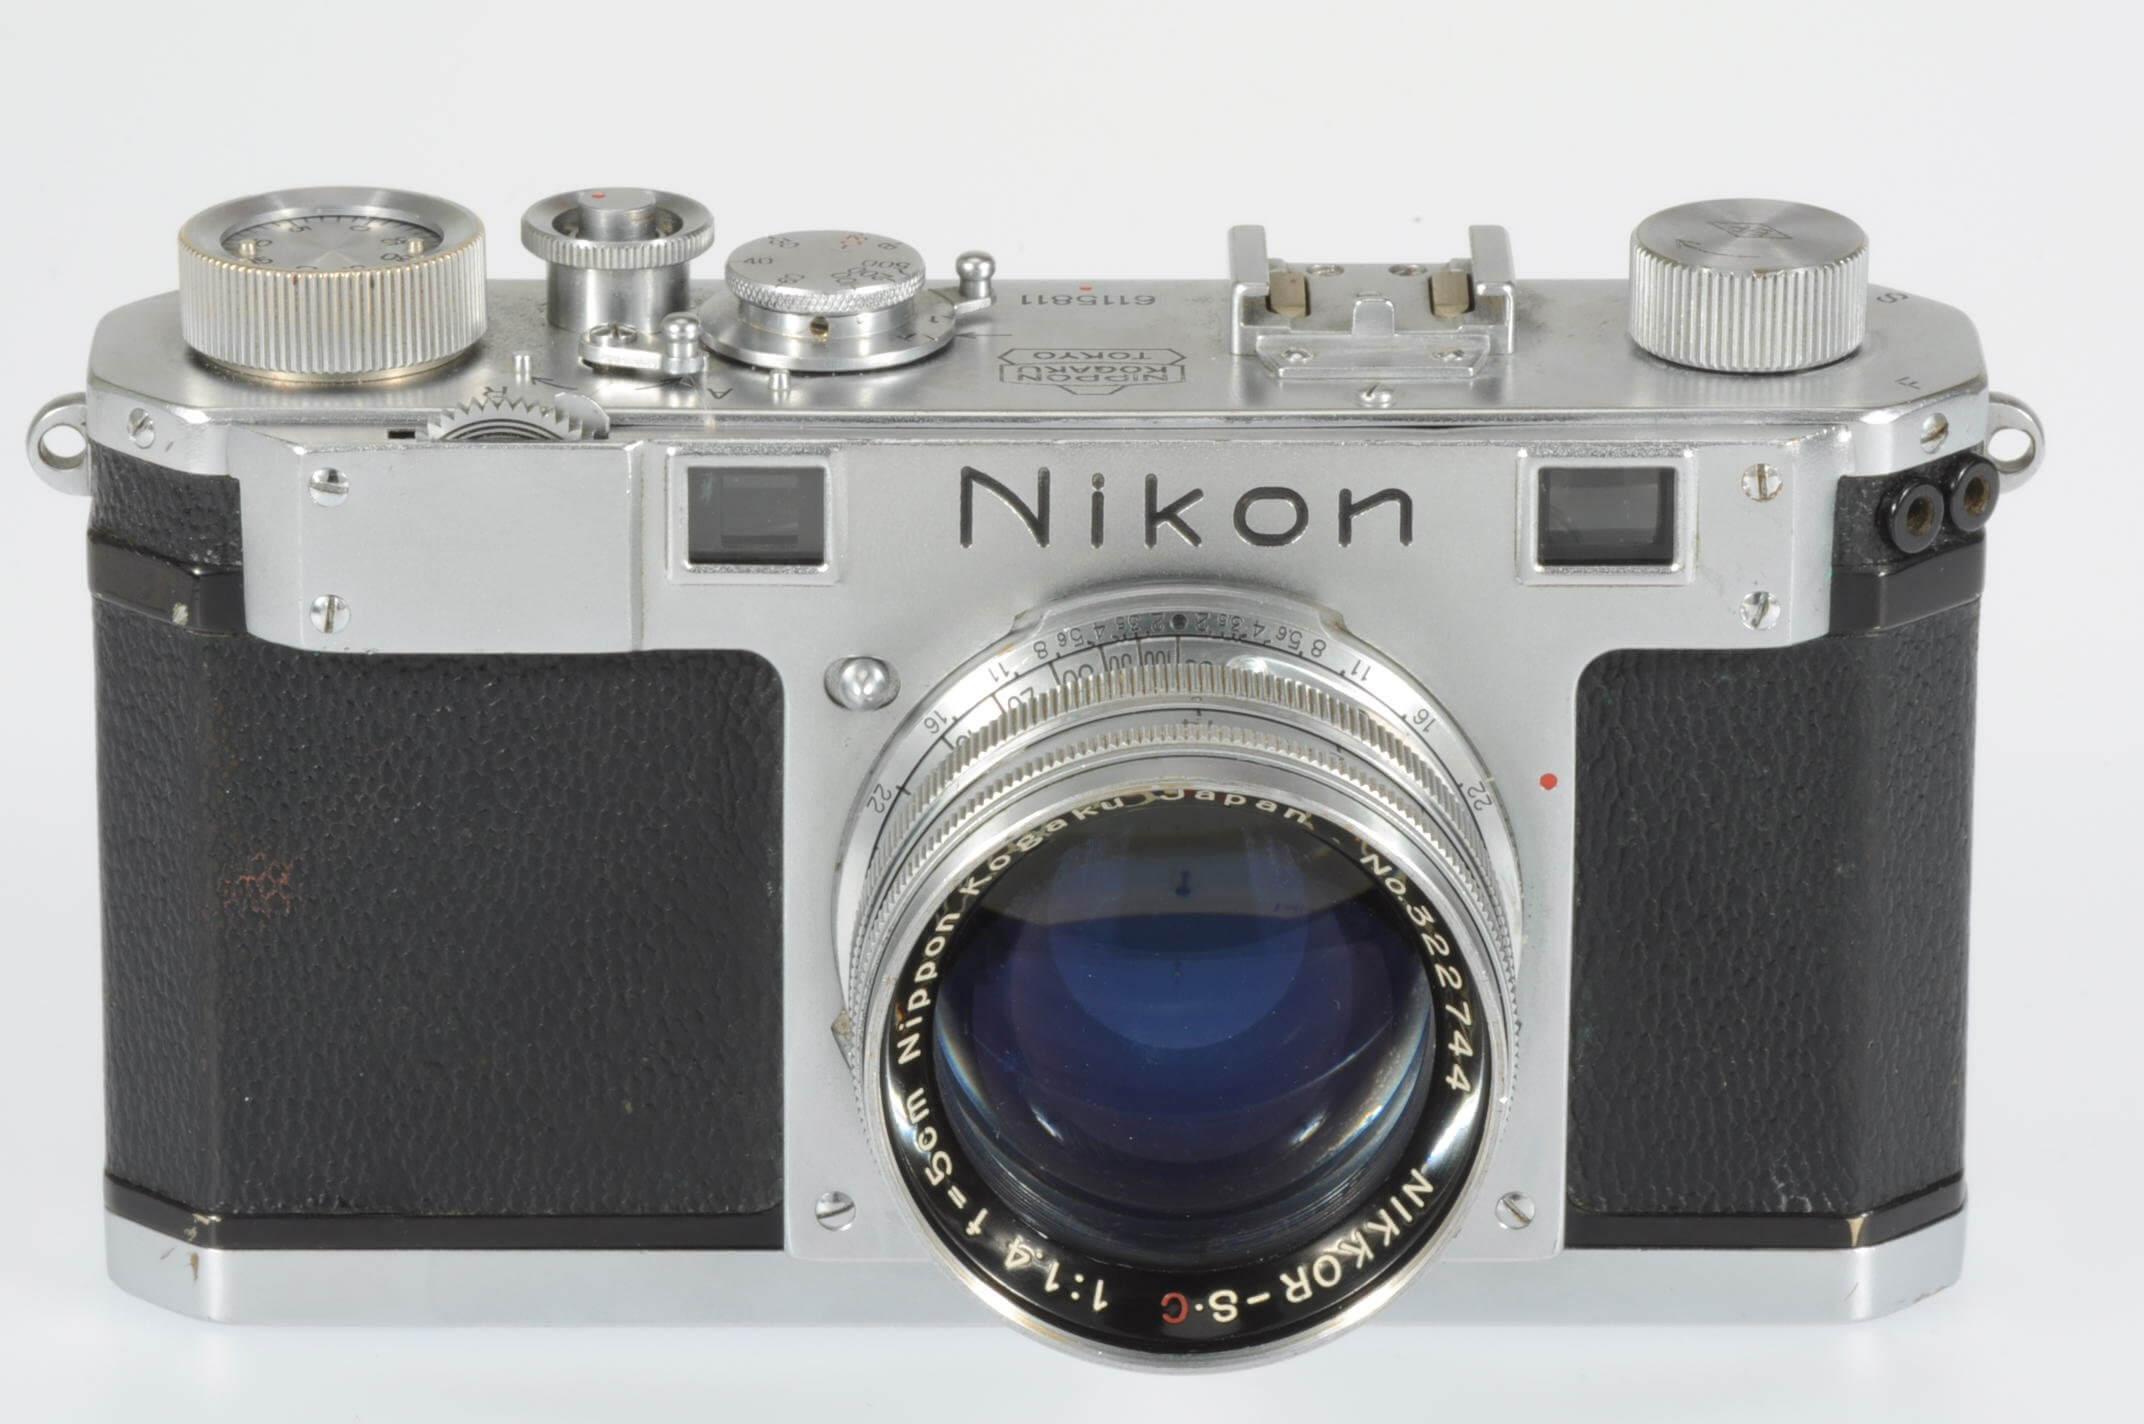 Nikon S rangefinder body with 5cm f1.4 lens, rare